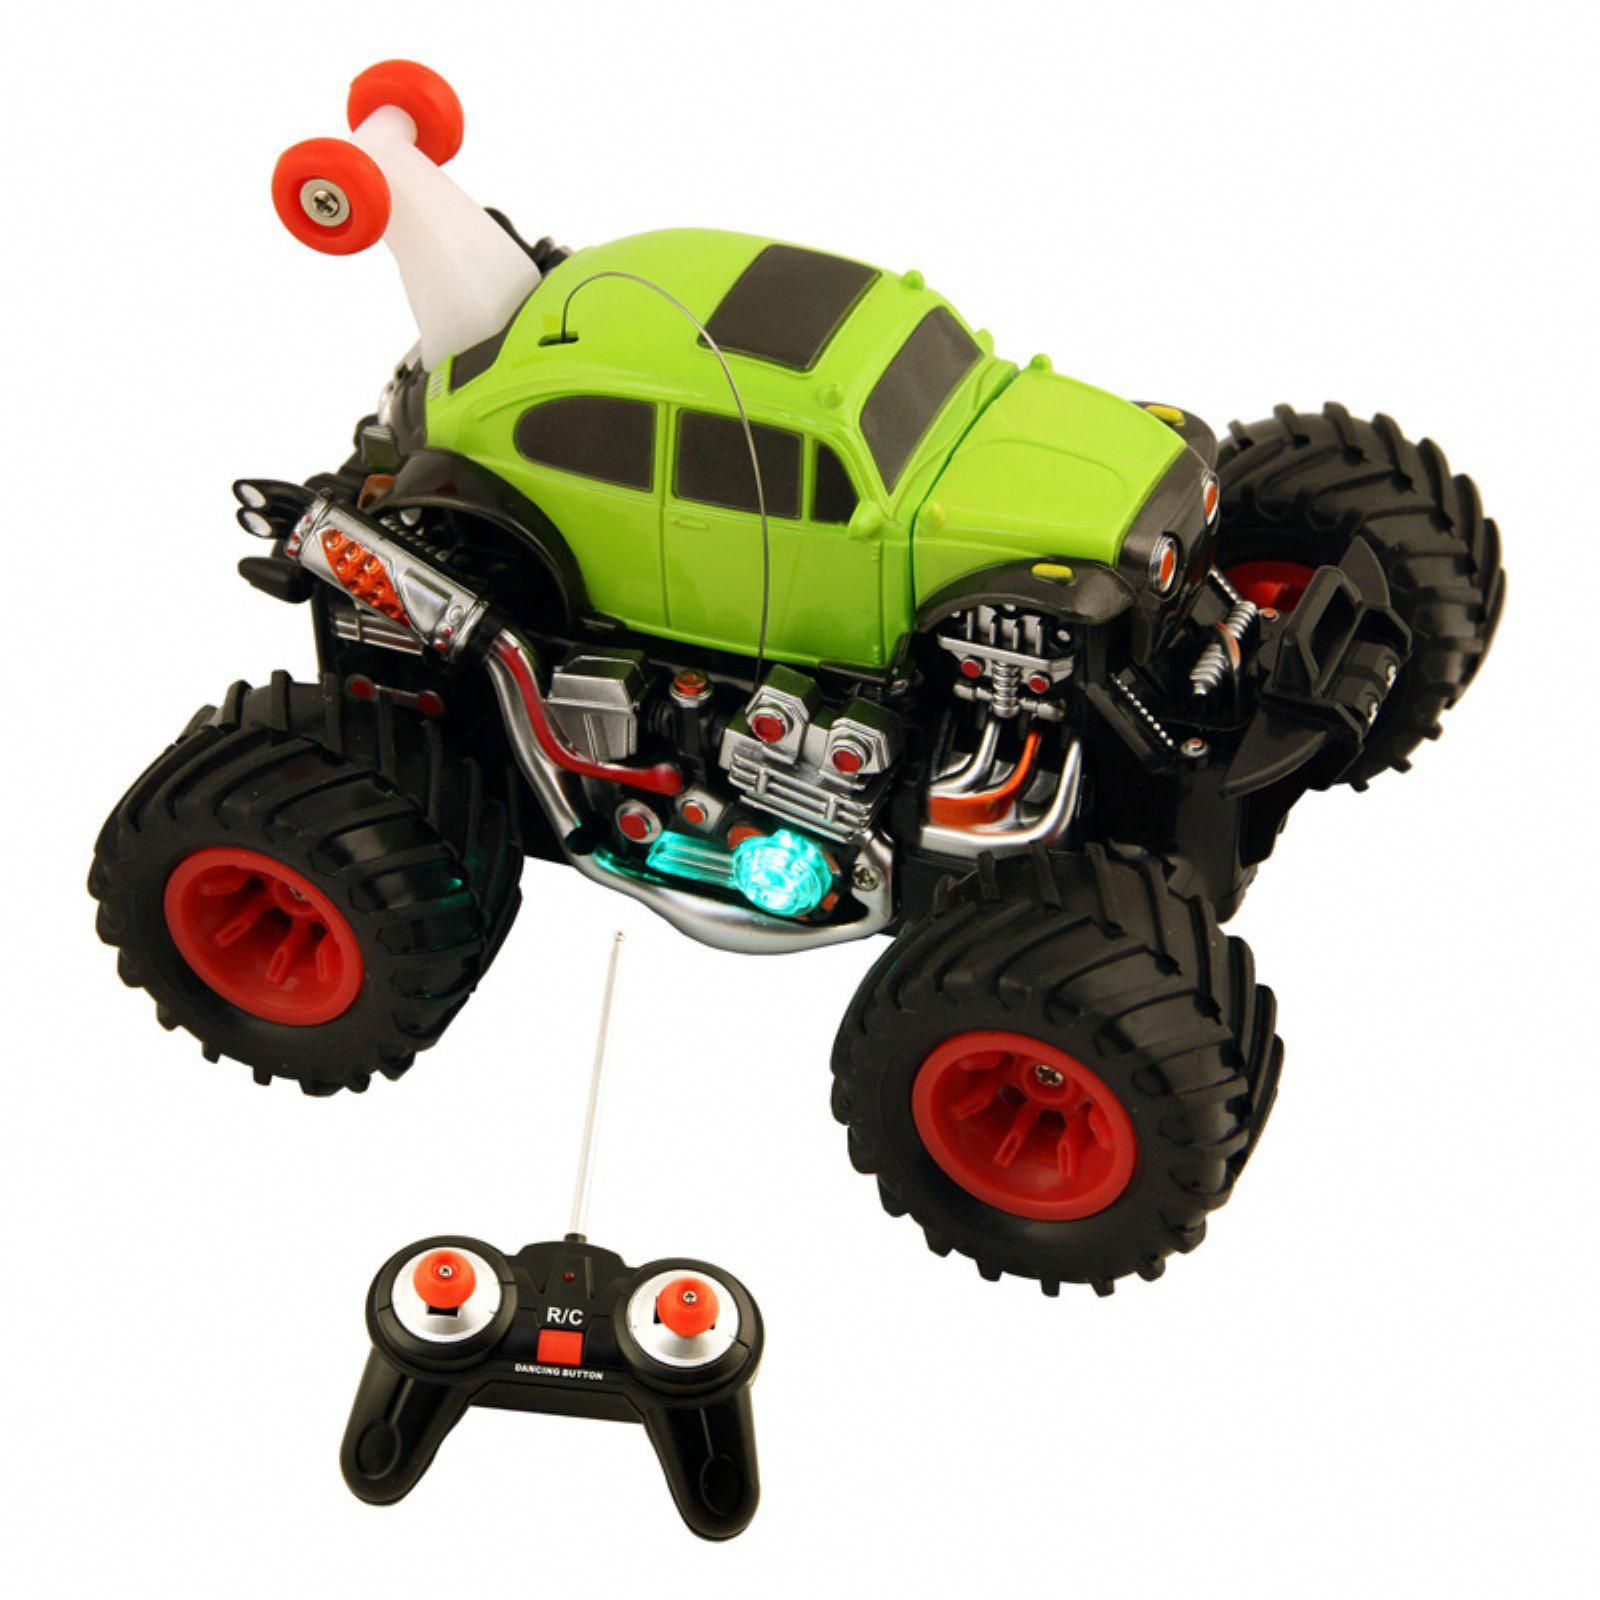 Flipo Tip Lorry Remote Control Stunt Car   Remote control ...